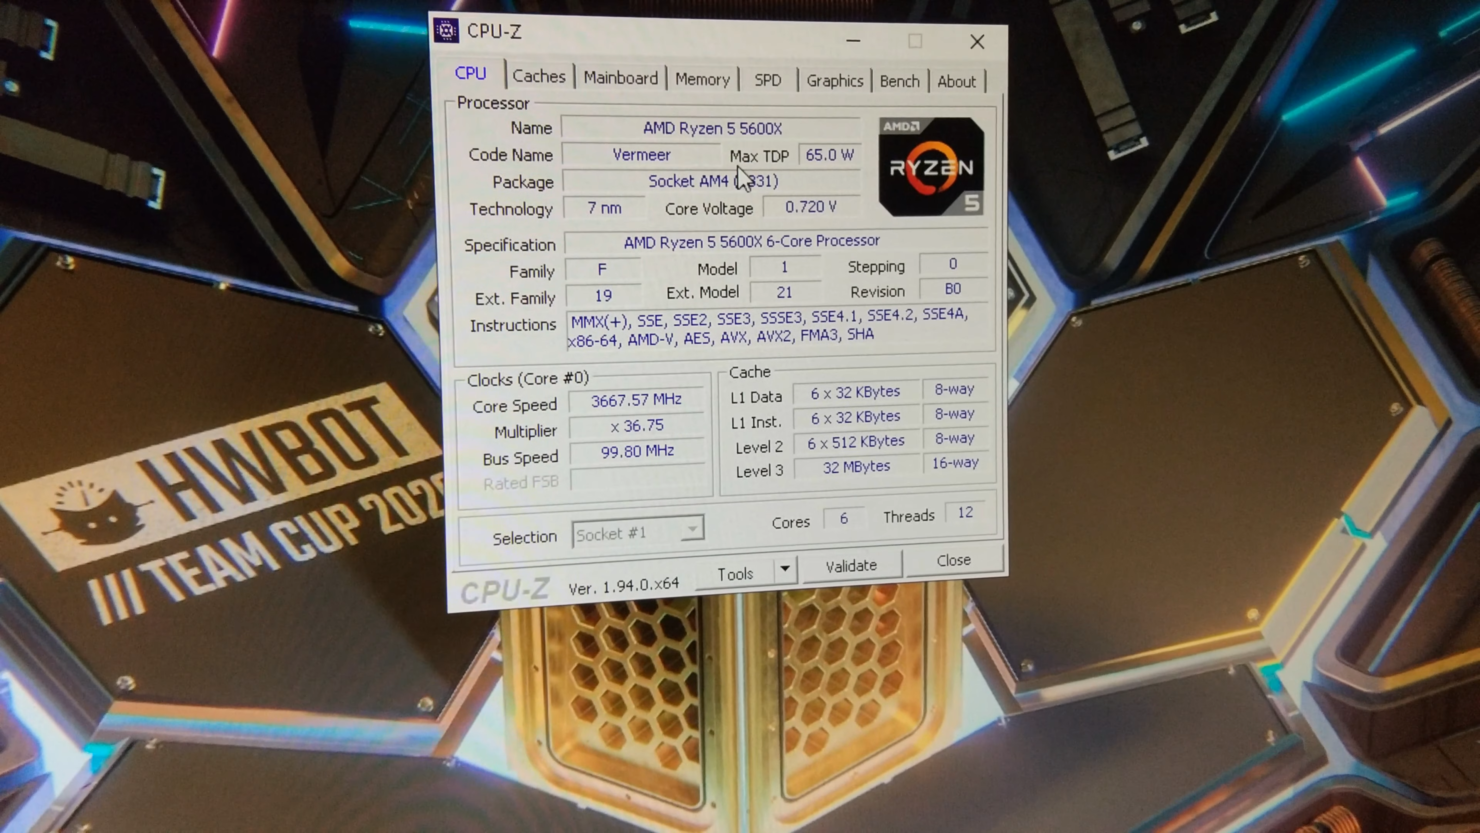 amd-ryzen-5-5600x-6-core-zen-3-cpu-benchmarks_stock_1